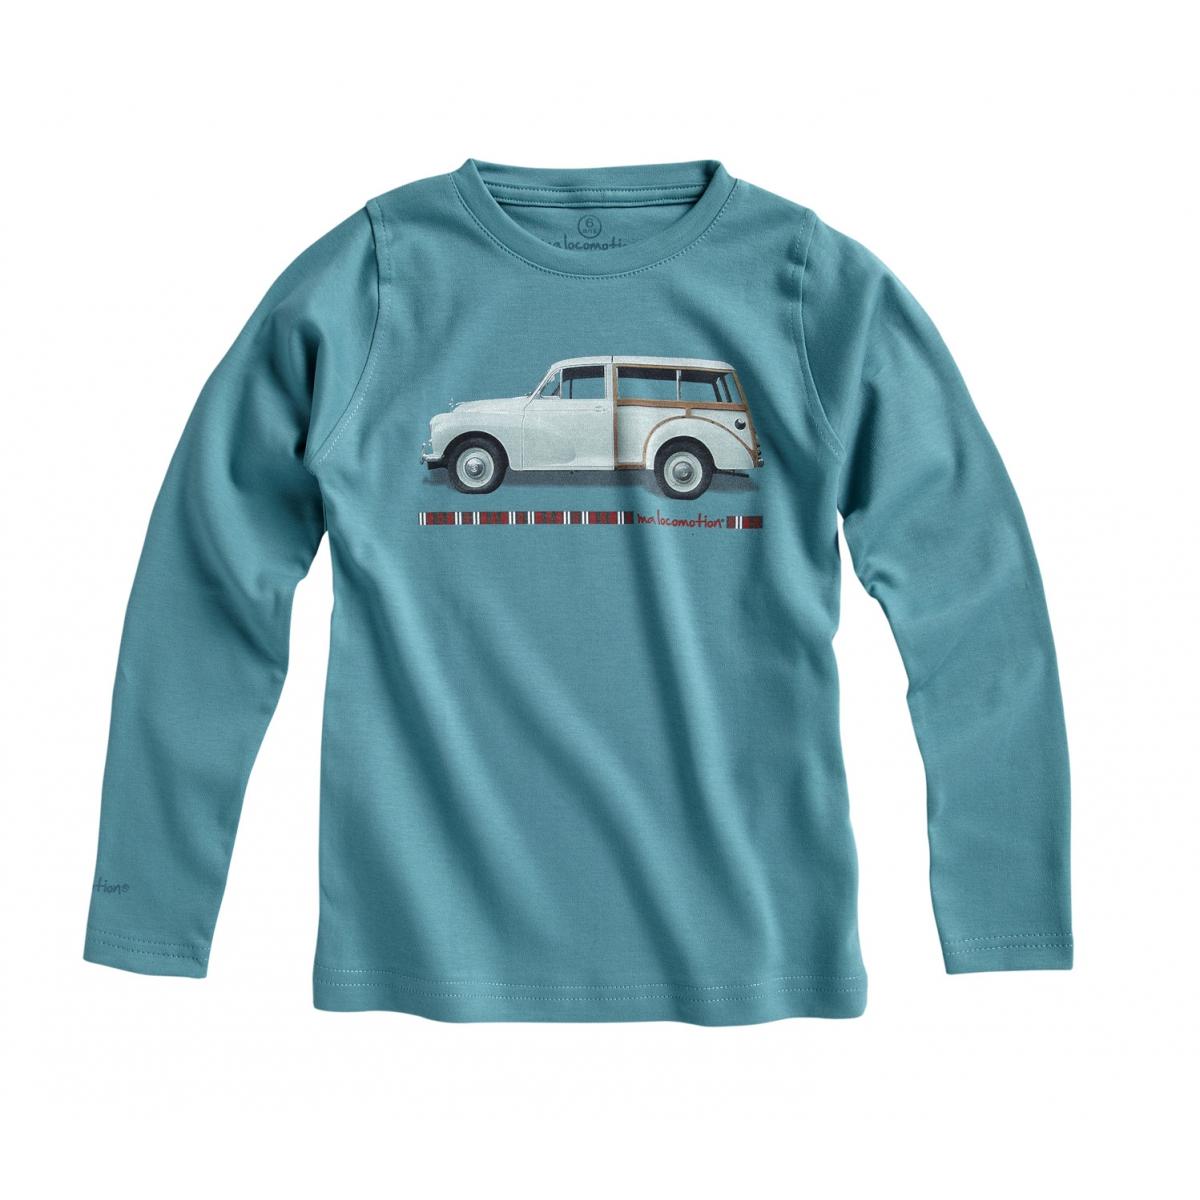 T-shirt voiture vintage Morris Minor